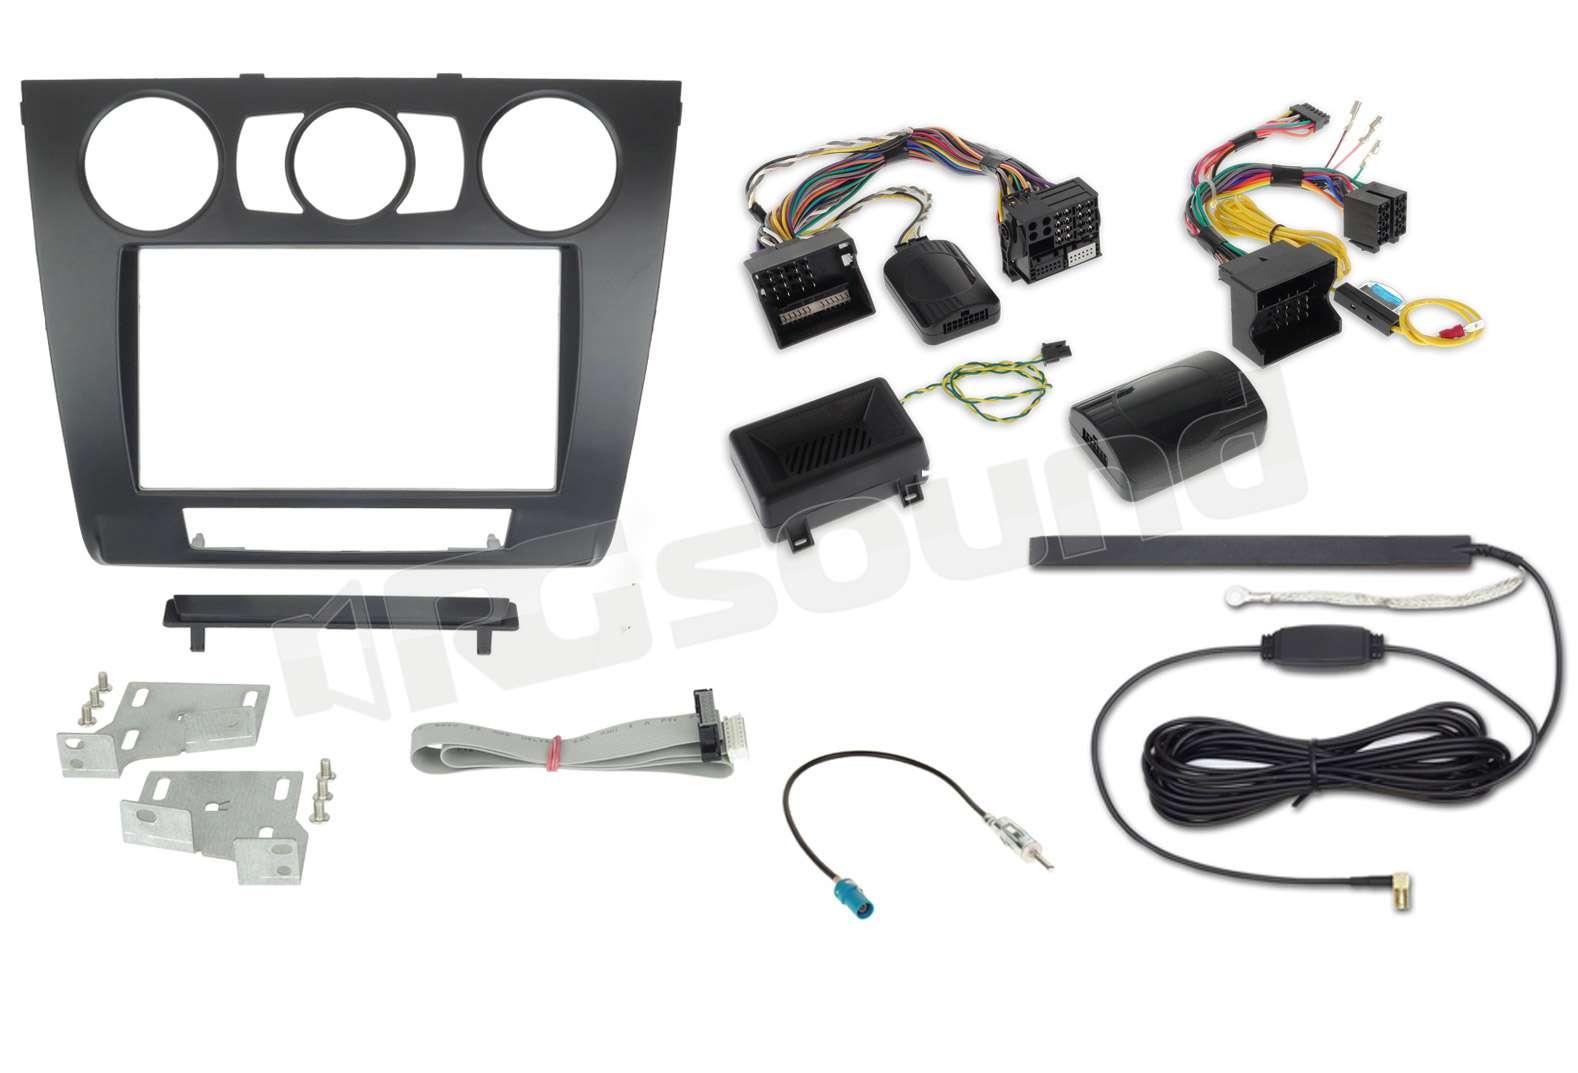 alpine kit 7bm1m kit bmw serie 1 con clima manuale installazione aut rg sound store. Black Bedroom Furniture Sets. Home Design Ideas